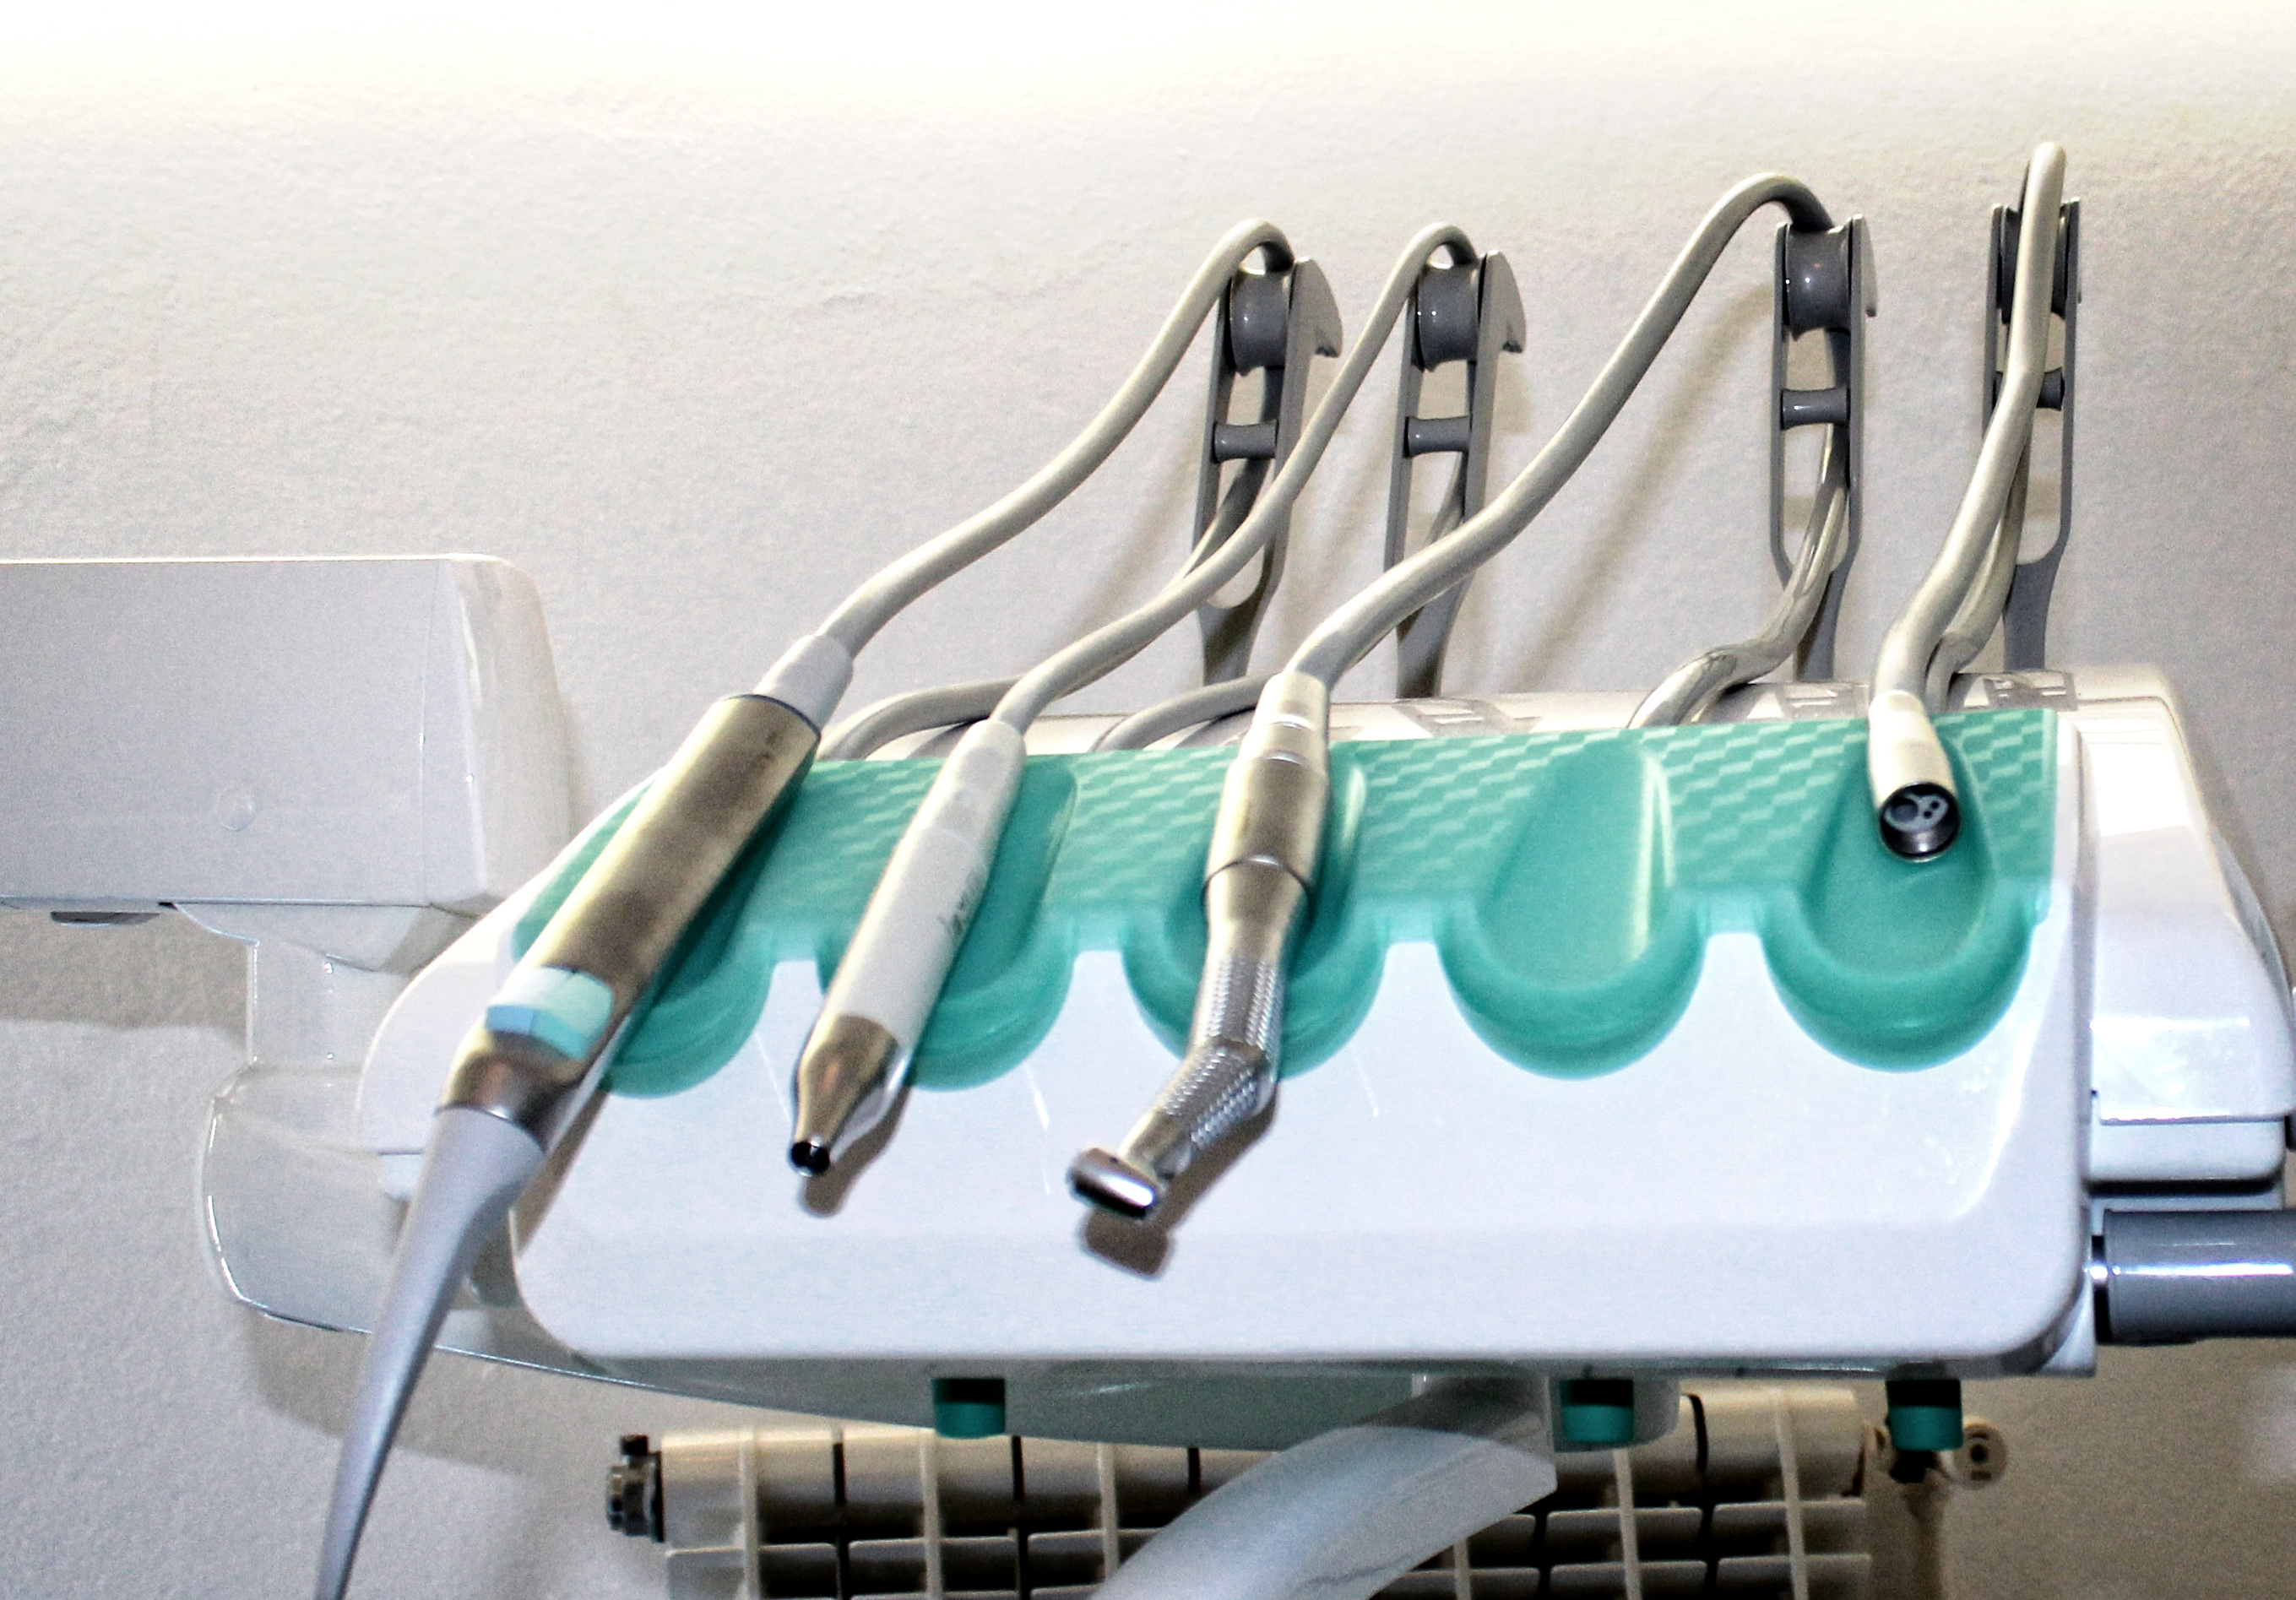 Set of dentist equipment - Medical equipment, Professional, Root, Scraper, Practice, HQ Photo